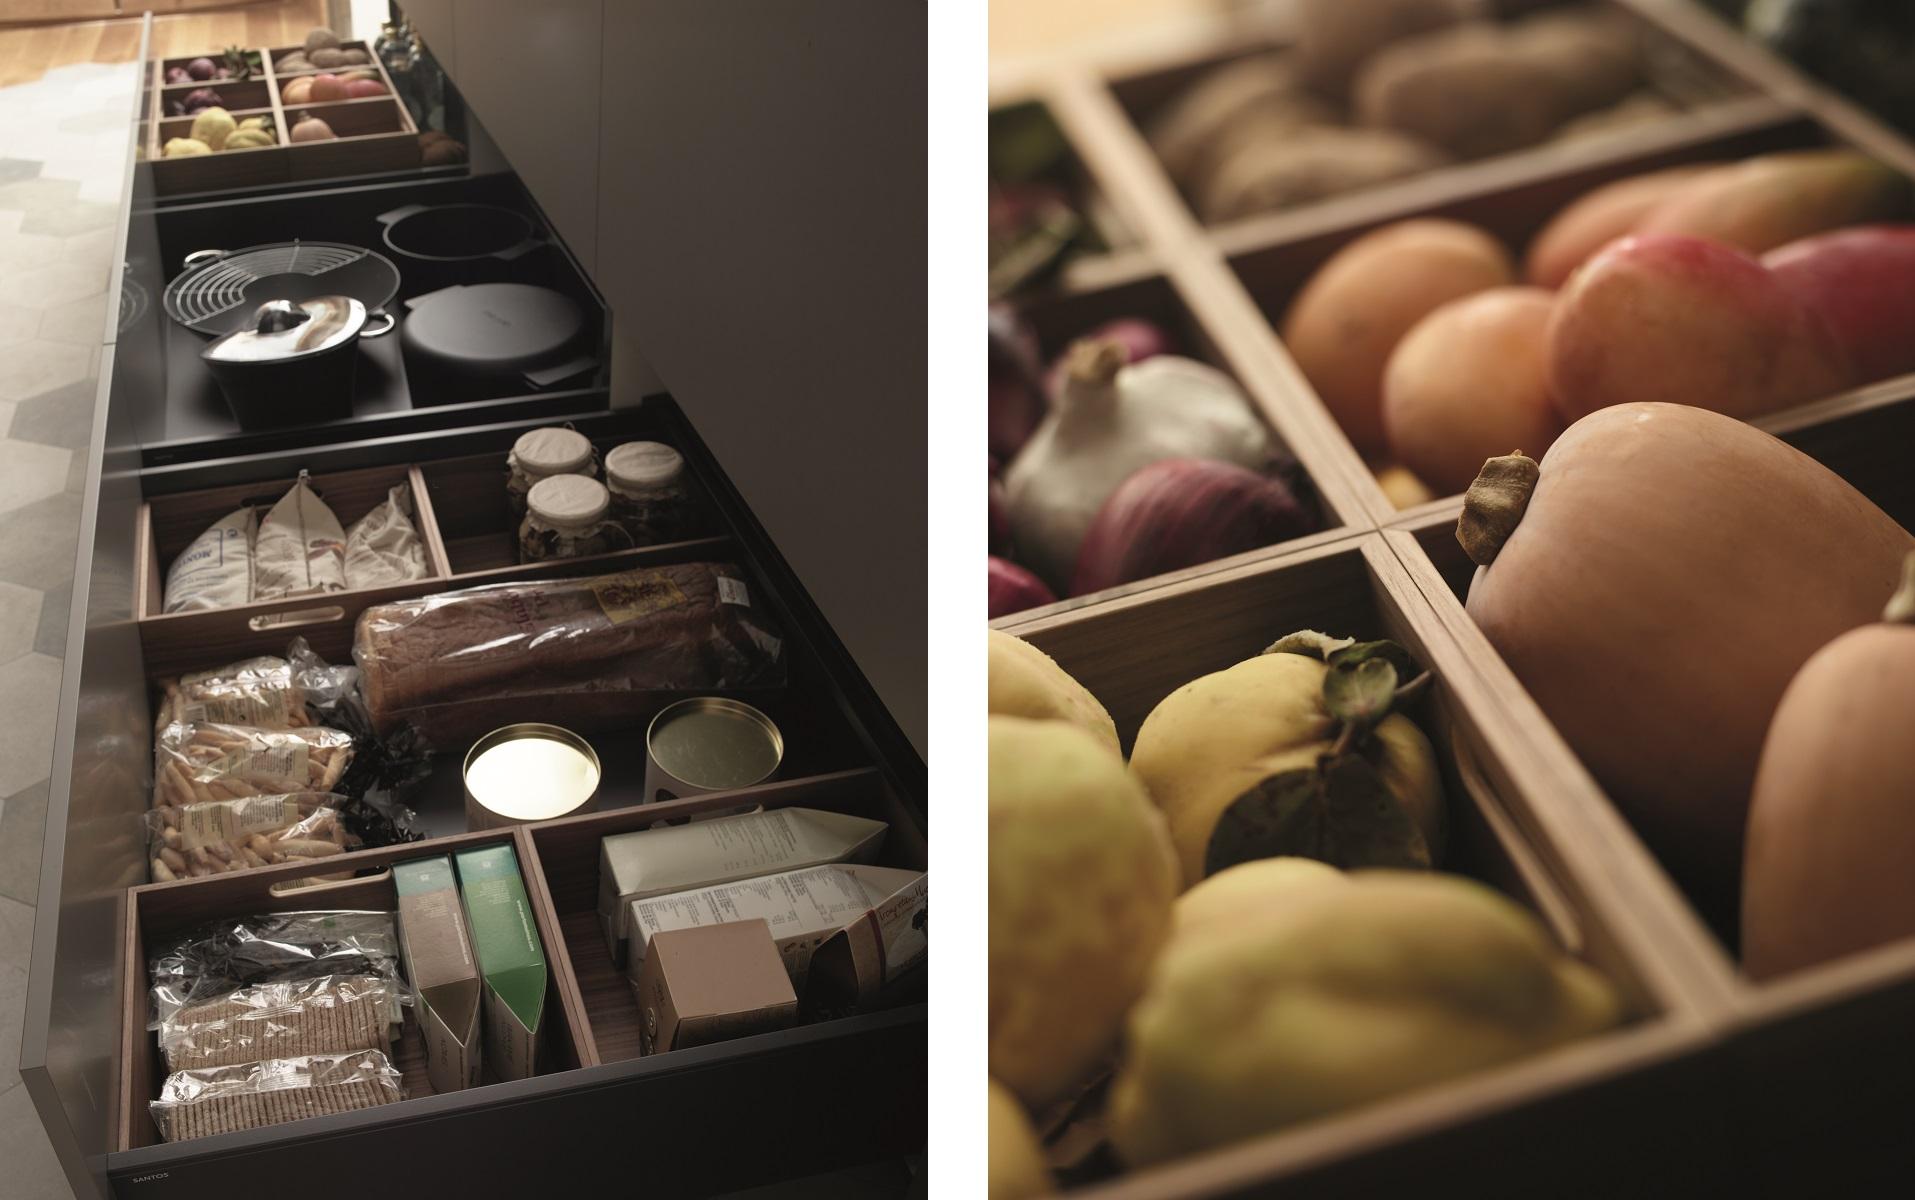 Organizadores extraíbles de armarios de cocina Santos